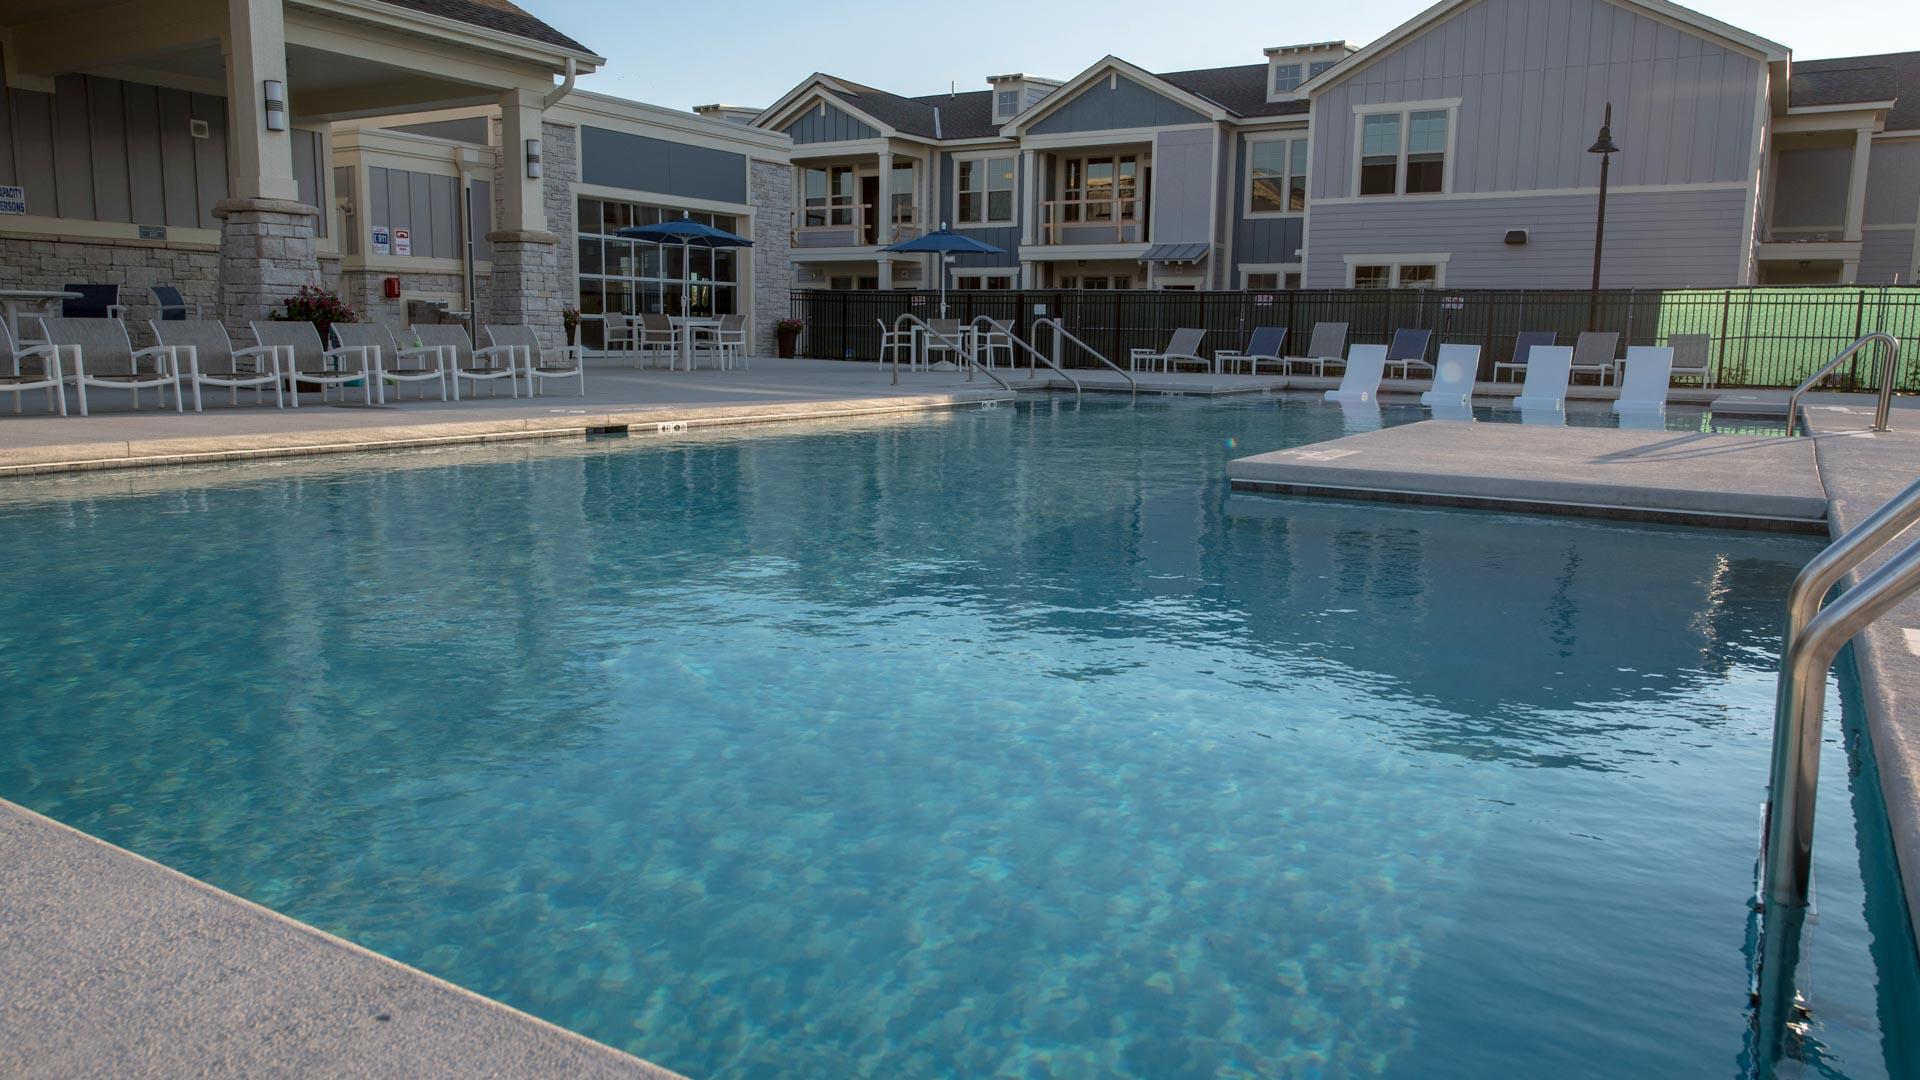 Huge luxury pool at Springs at Kenosha apartments in Kenosha WI-52